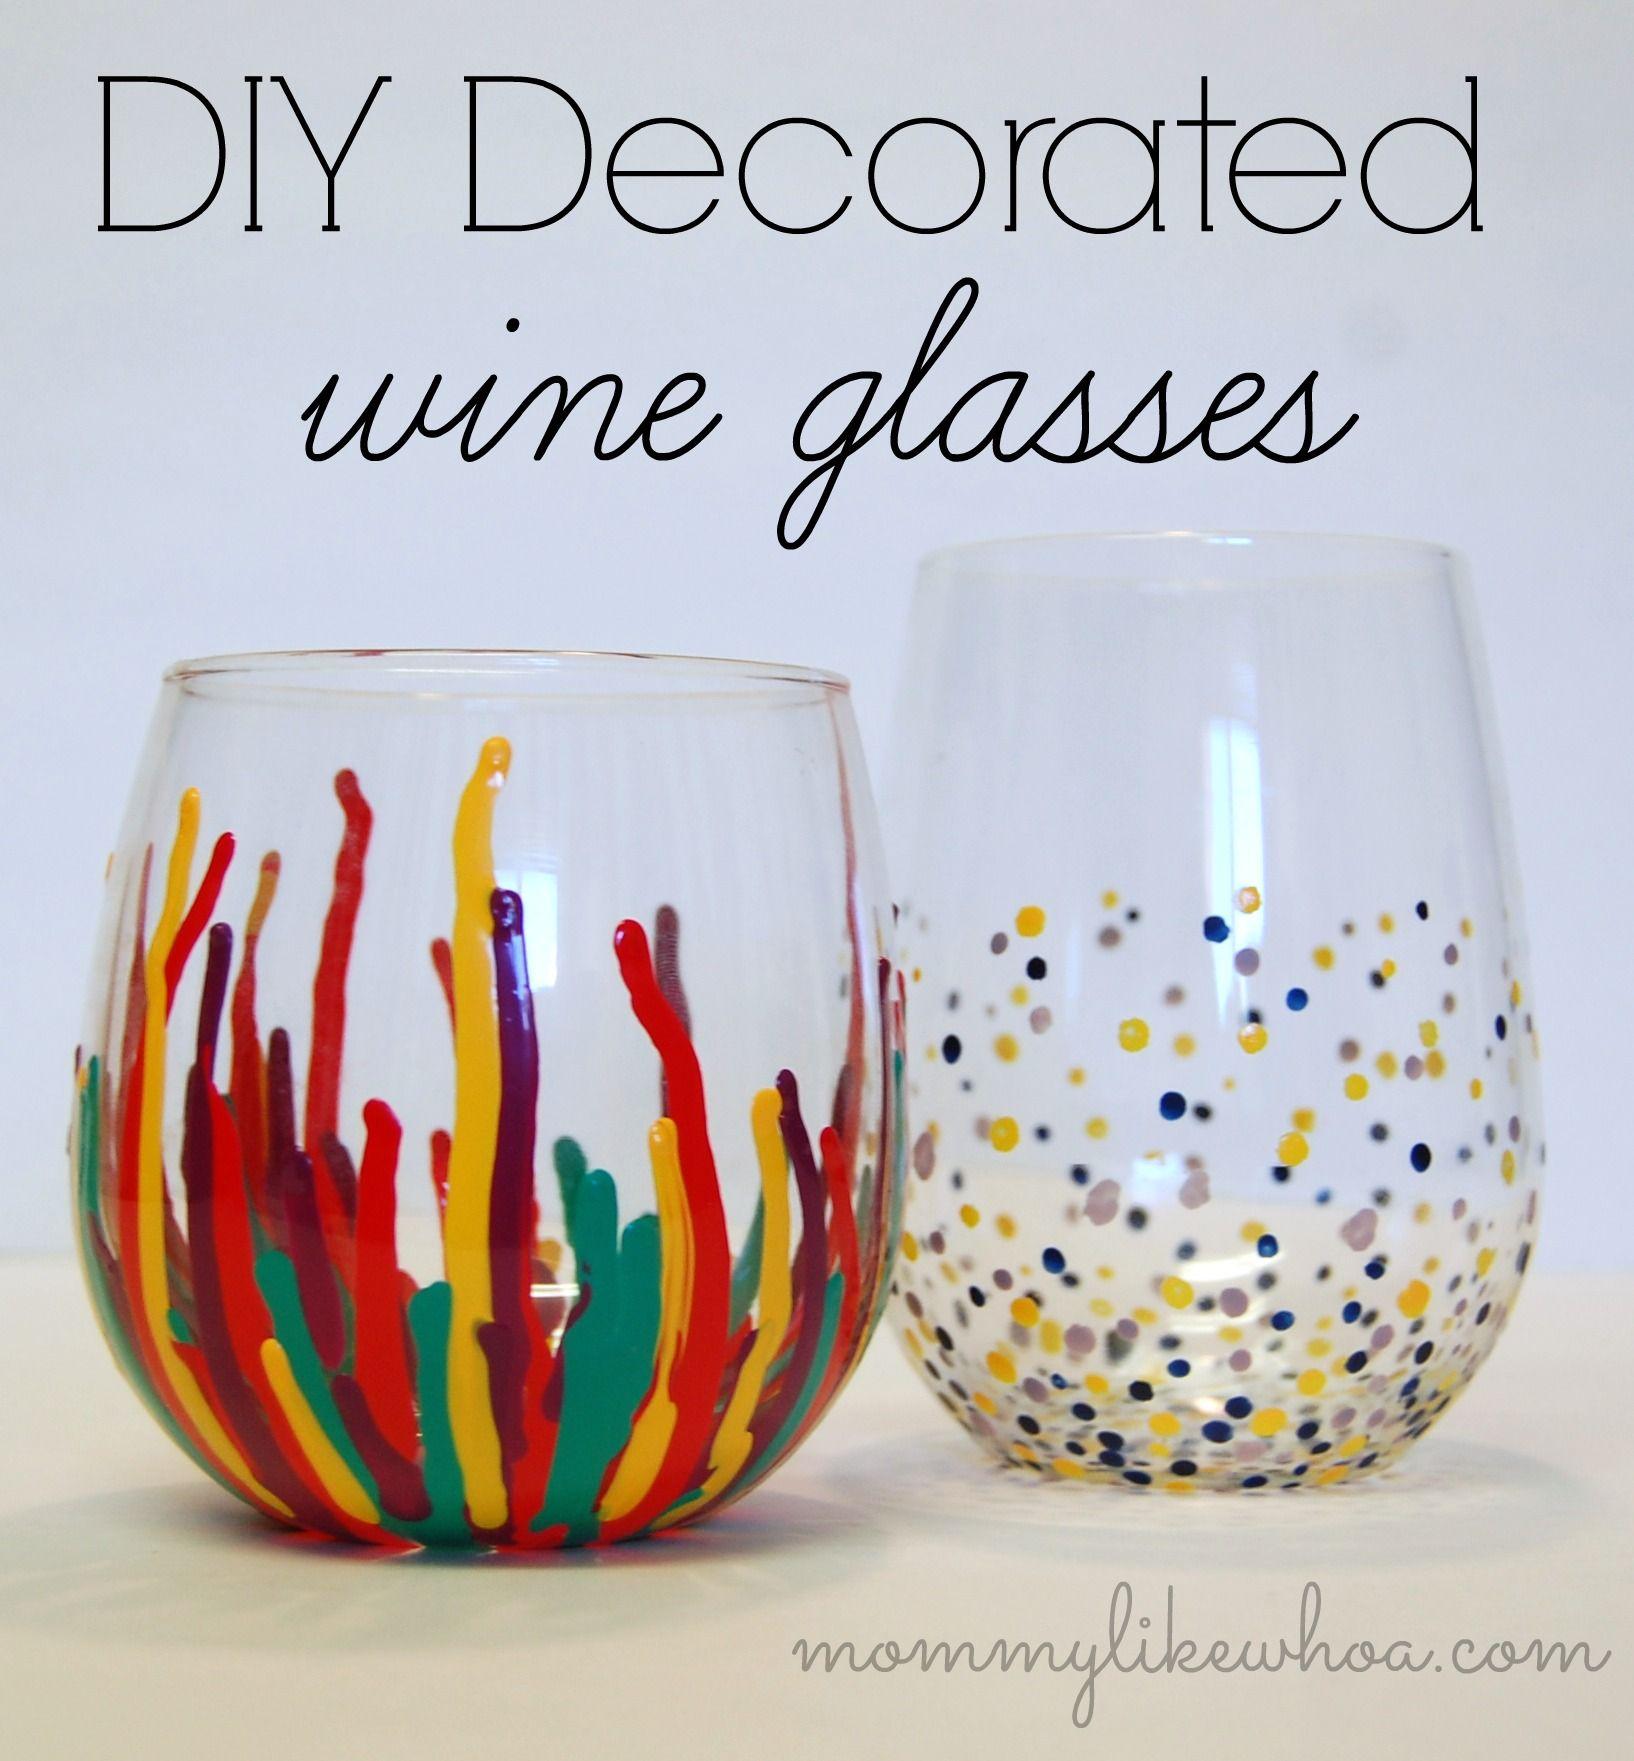 Diy Decorated Wine Glasses Mommy Like Whoa Decorated Wine